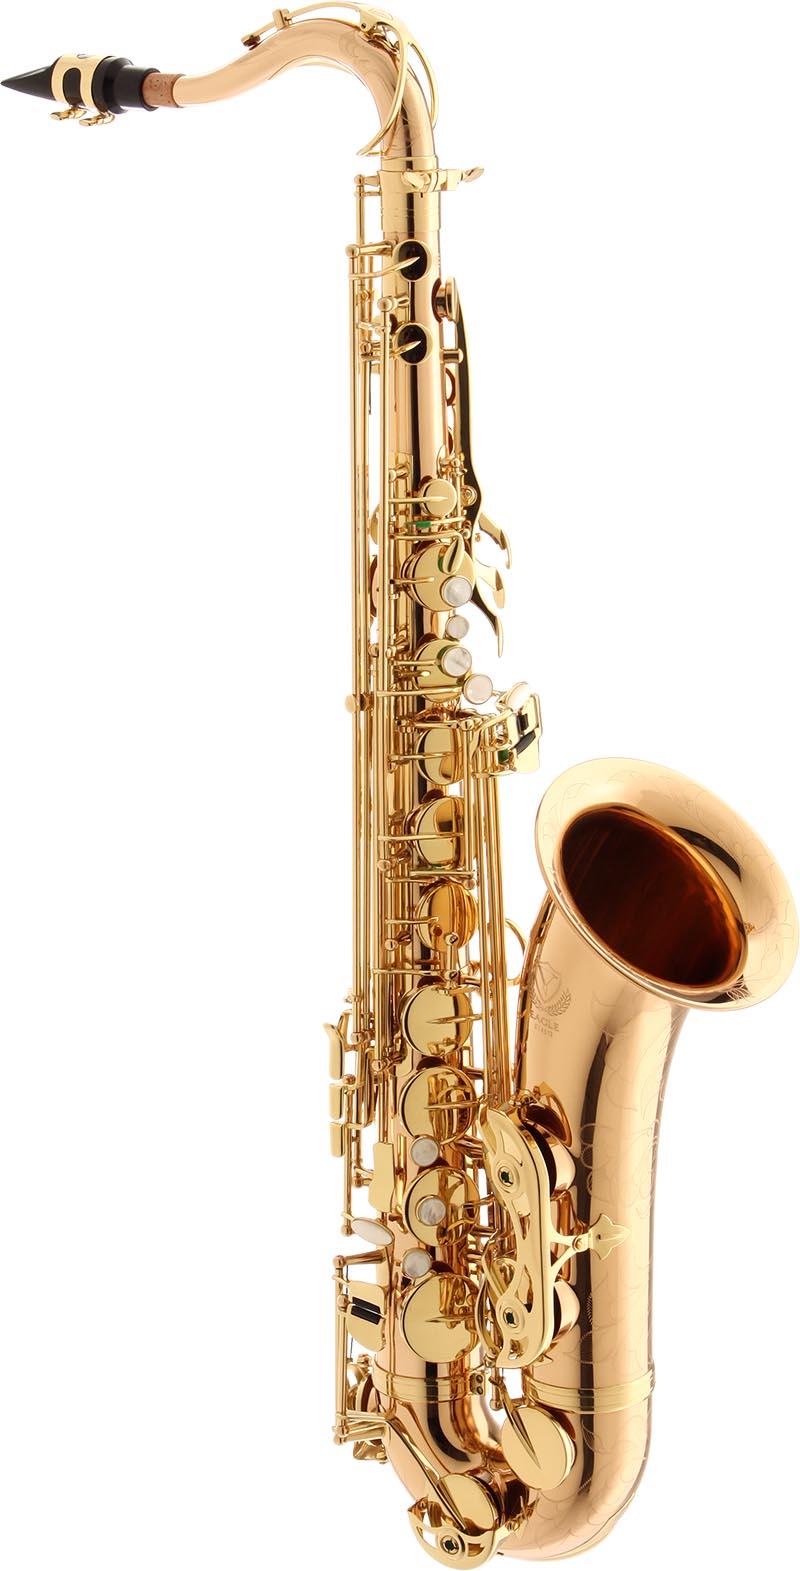 stx513 saxofone tenor de bronze eagle stx513 laqueado